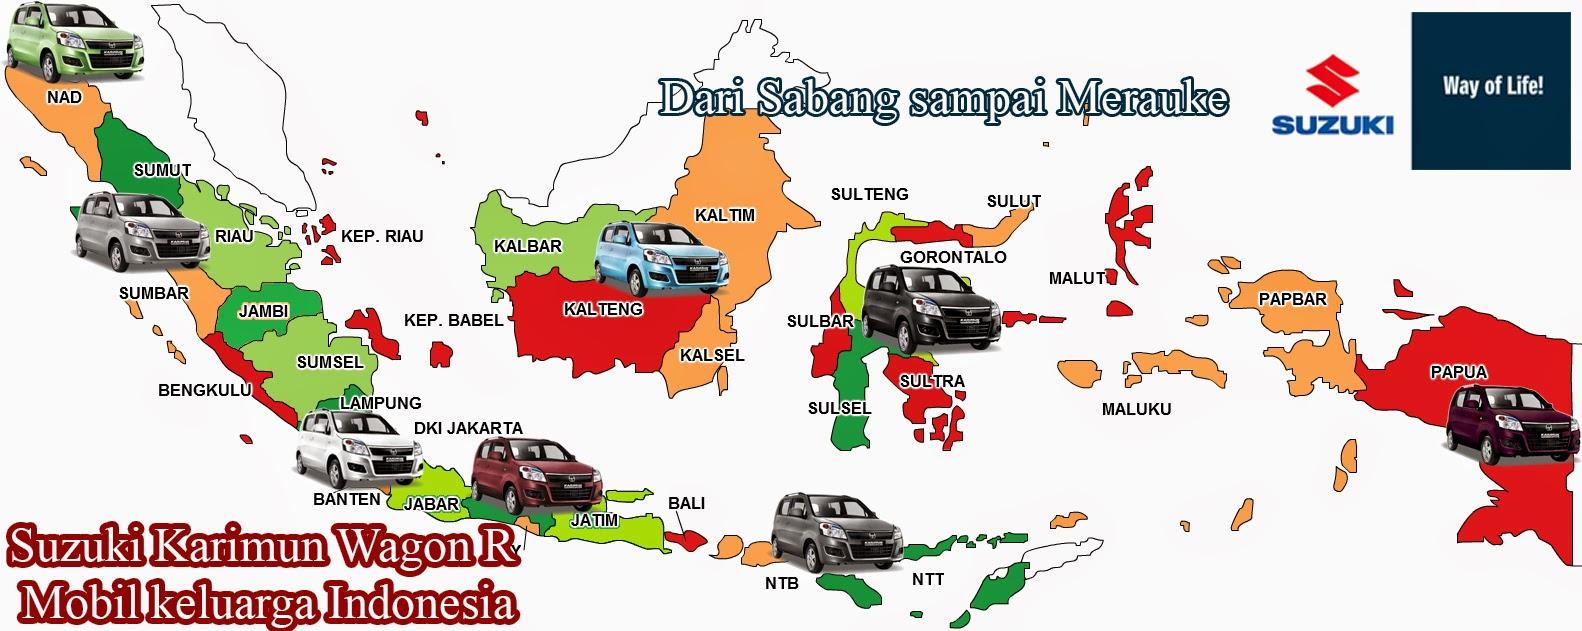 Bersama Suzuki Karimun Wagon R, Mobil Keluarga Indonesia